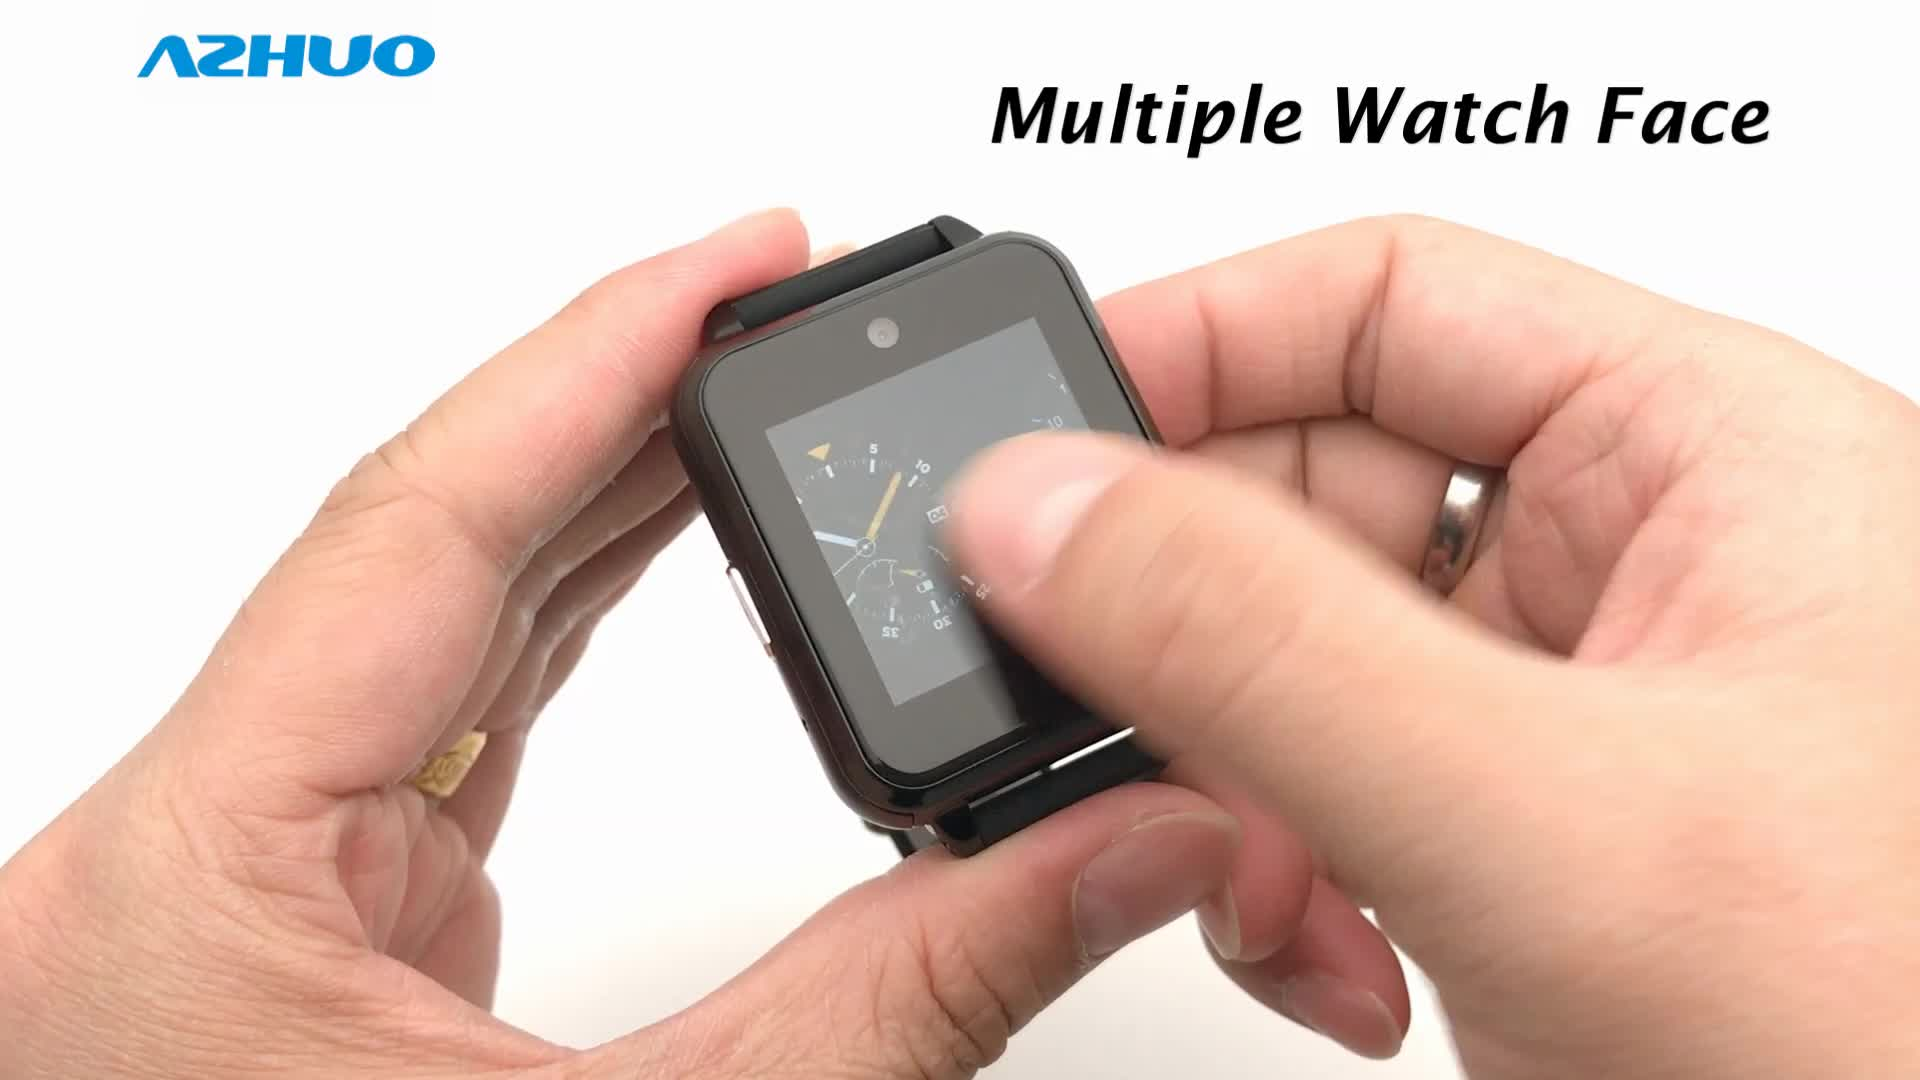 Q1 Pro new Q2 4G Smart Watch MTK6737 Quad Core 1GB RAM 16GB ROM Android 6.0 Wifi GPS Camera Heart Rate Blood Pressure Smartwatch